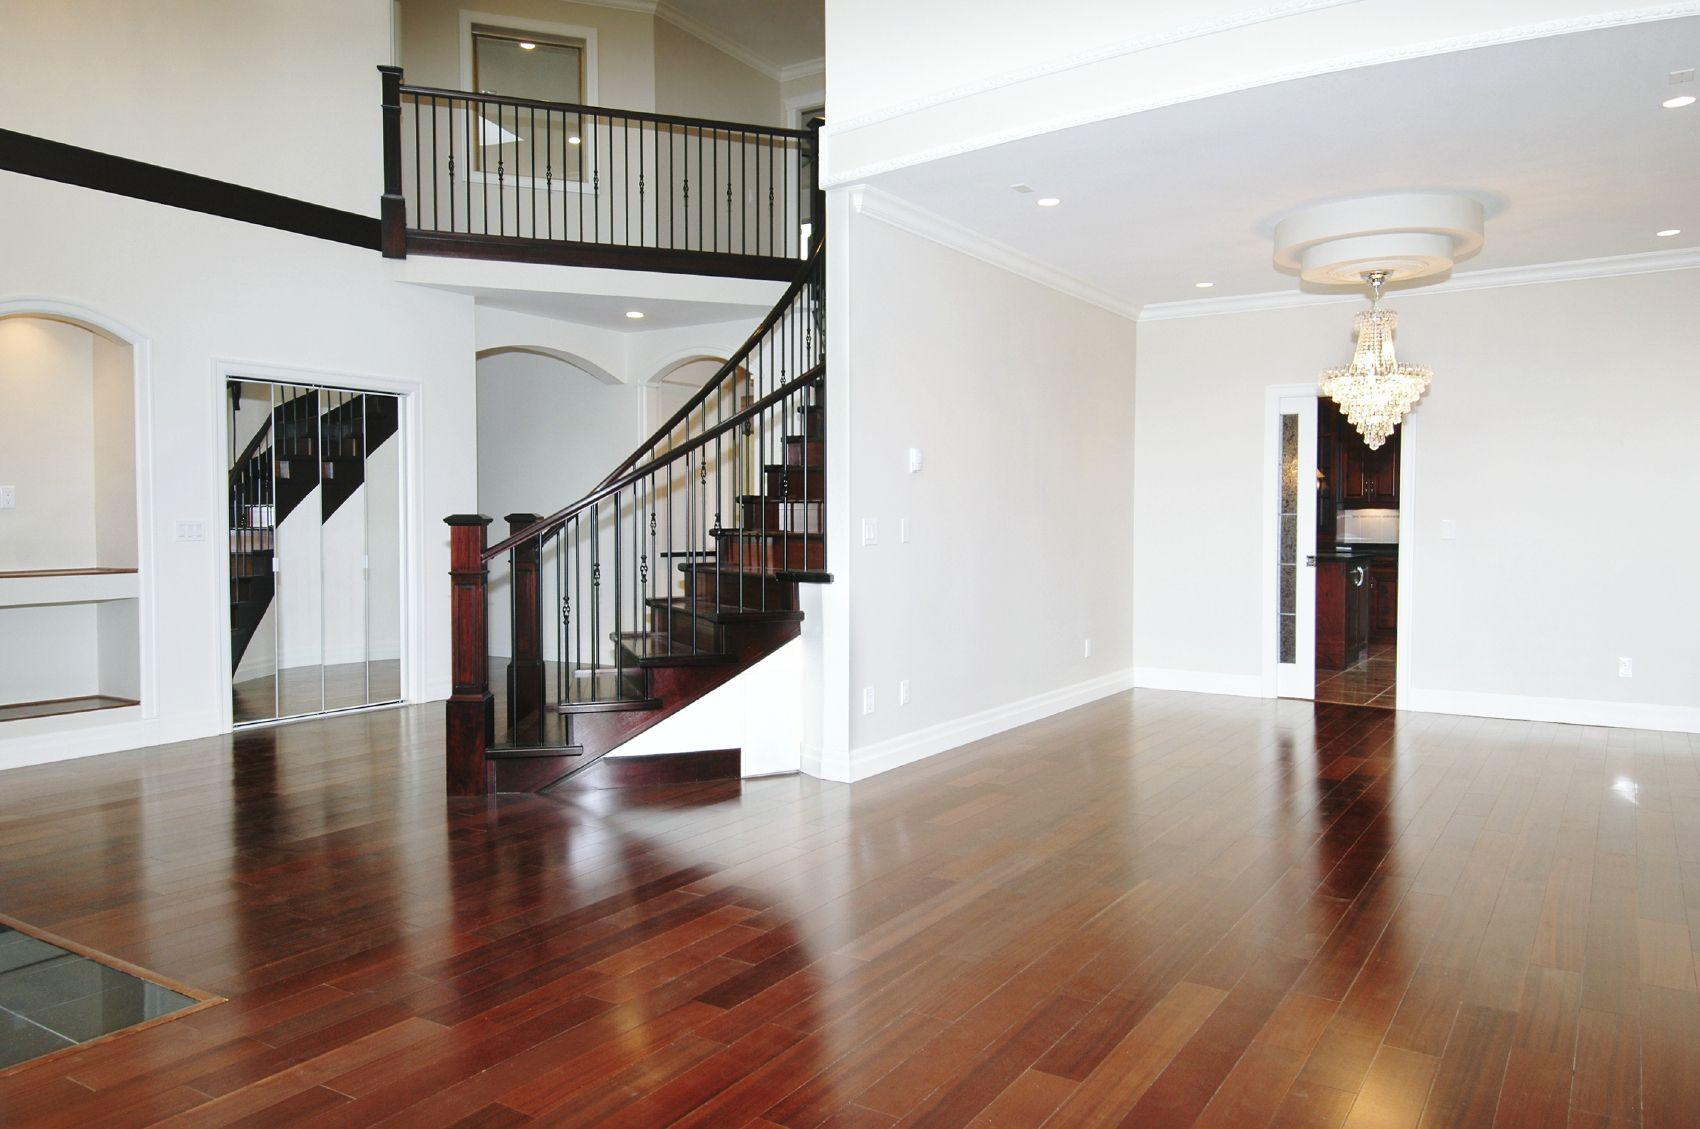 Brazilian Cherrywood Hardwood Floors In Atlanta Ga By Metro Atl Floors Inc Installing Hardwood Floors Hardwood Floors Flooring